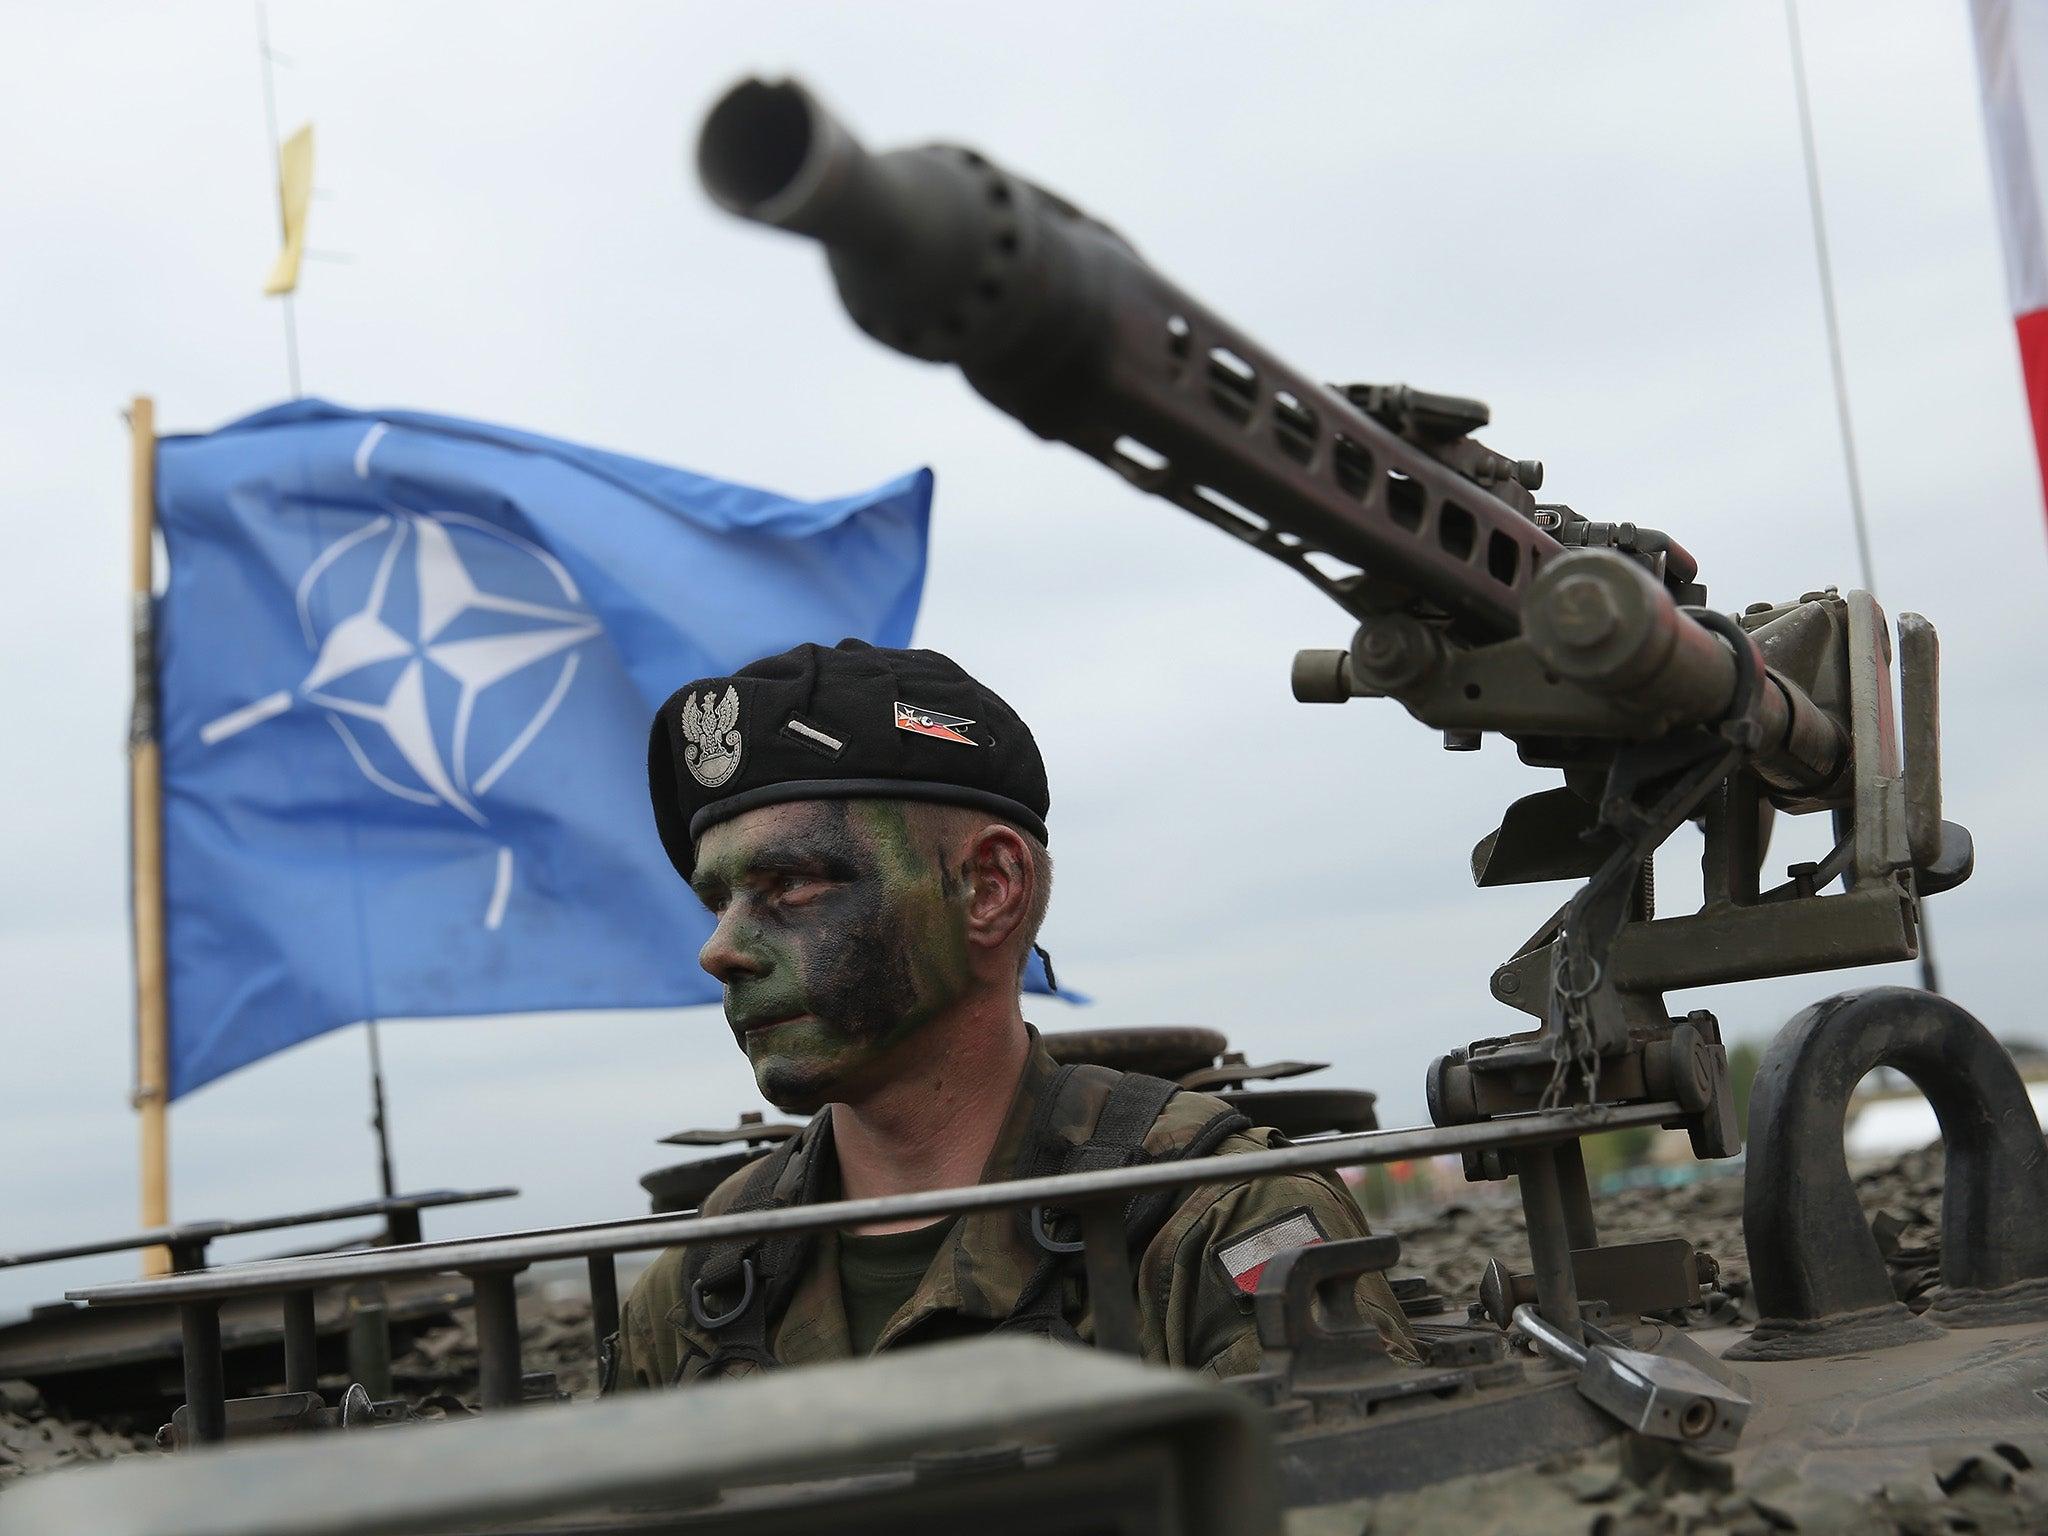 Ubeskyttet Samleie Krakow Eskorte